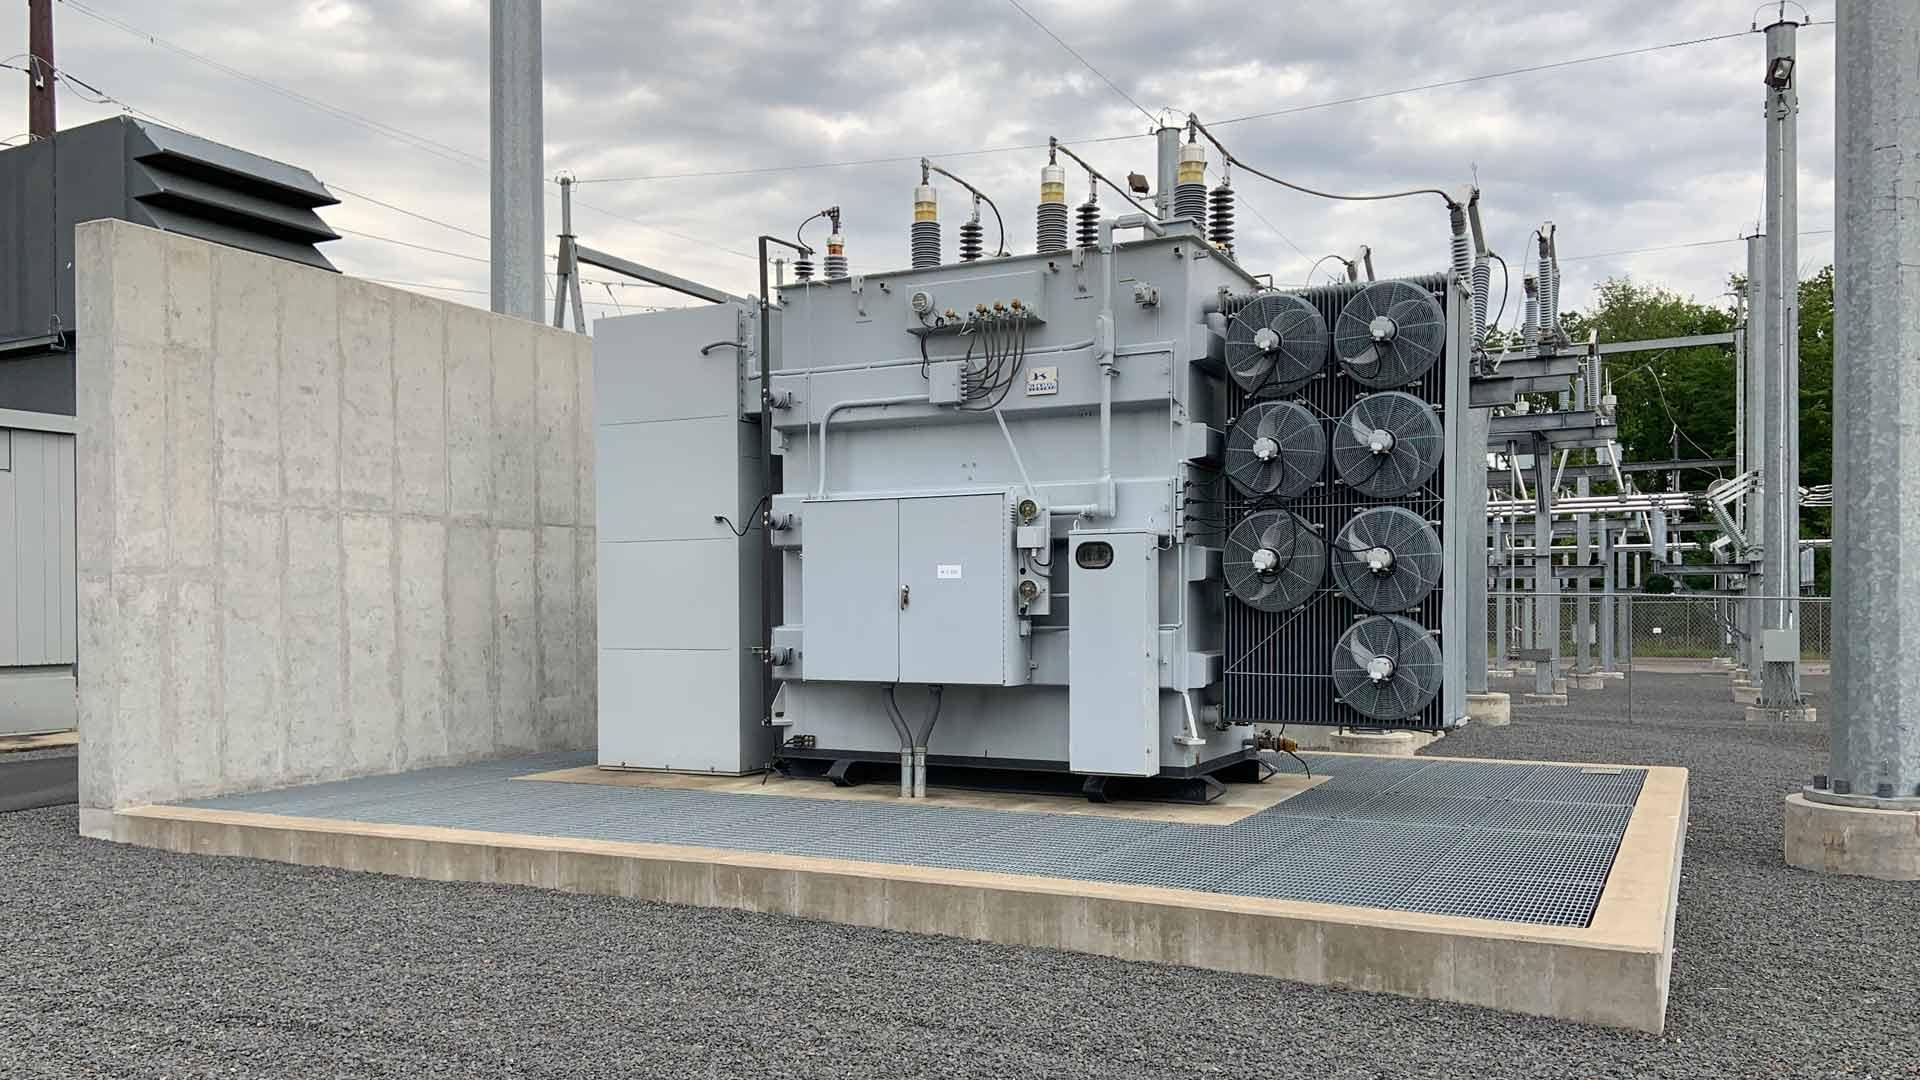 Marshfield utilities site